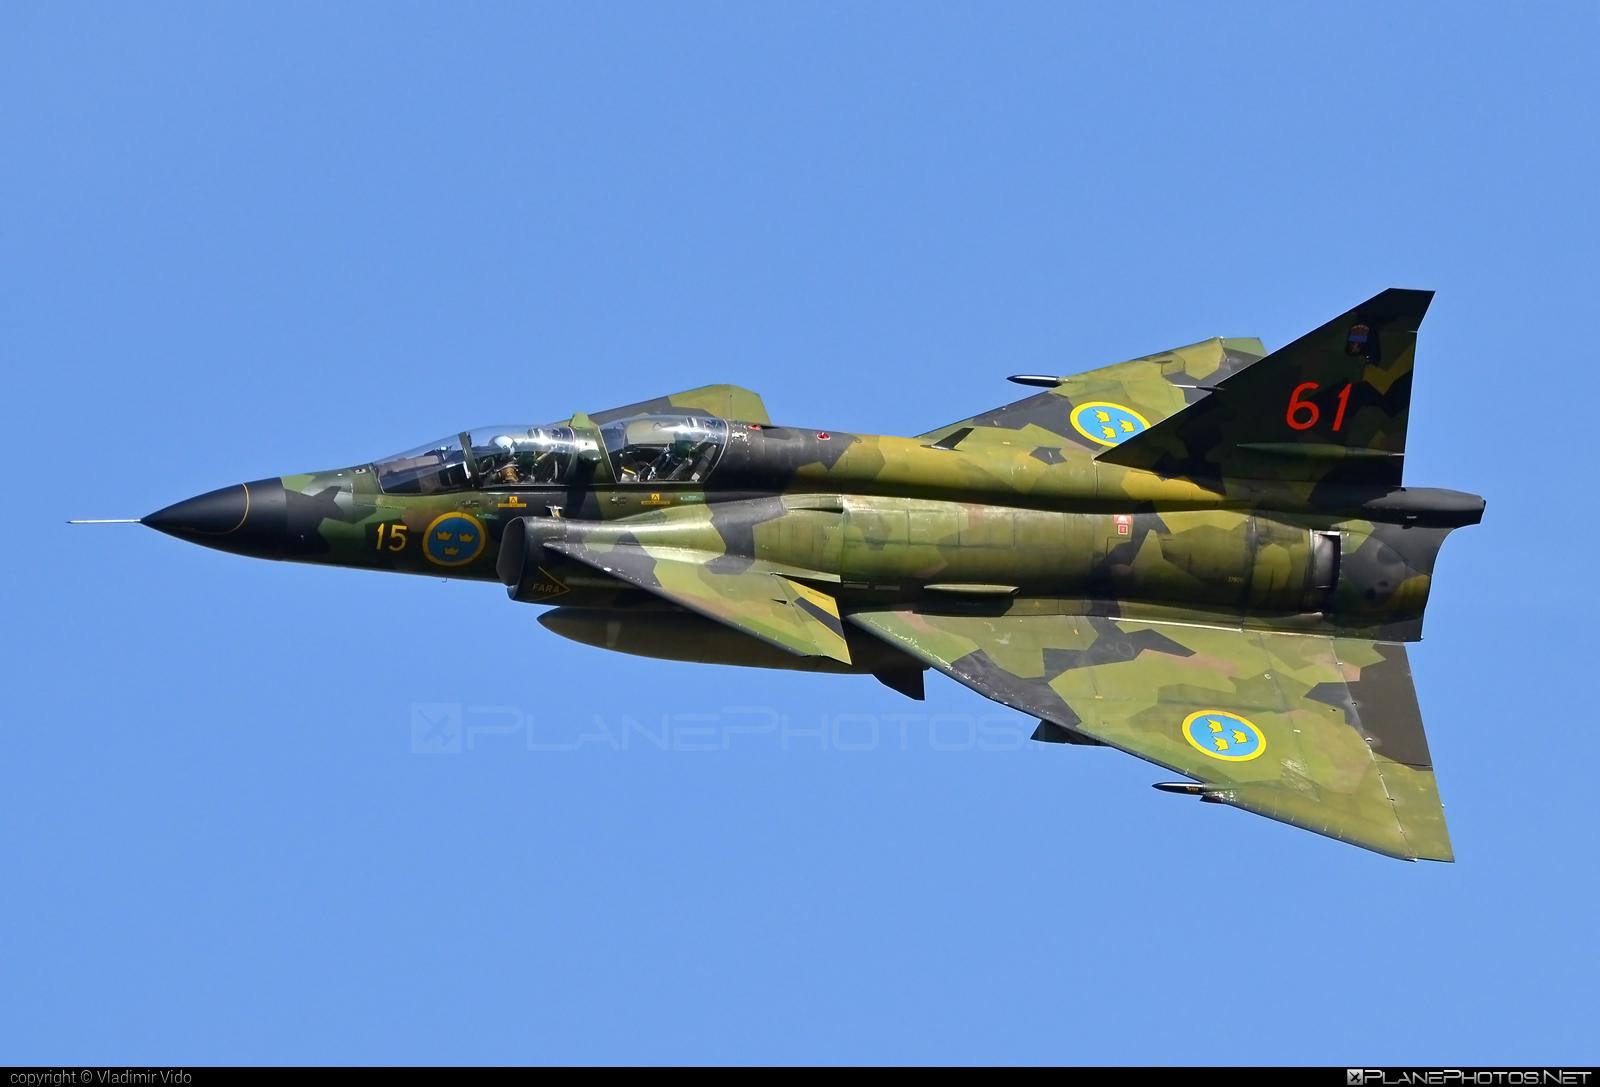 Saab Sk 37E Viggen - SE-DXO operated by Swedish Air Force Historic Flight #dnynato2018 #natodays2018 #saab #saab37 #saabsk37e #saabsk37eviggen #saabsk37viggen #saabviggen #sk37eviggen #viggen